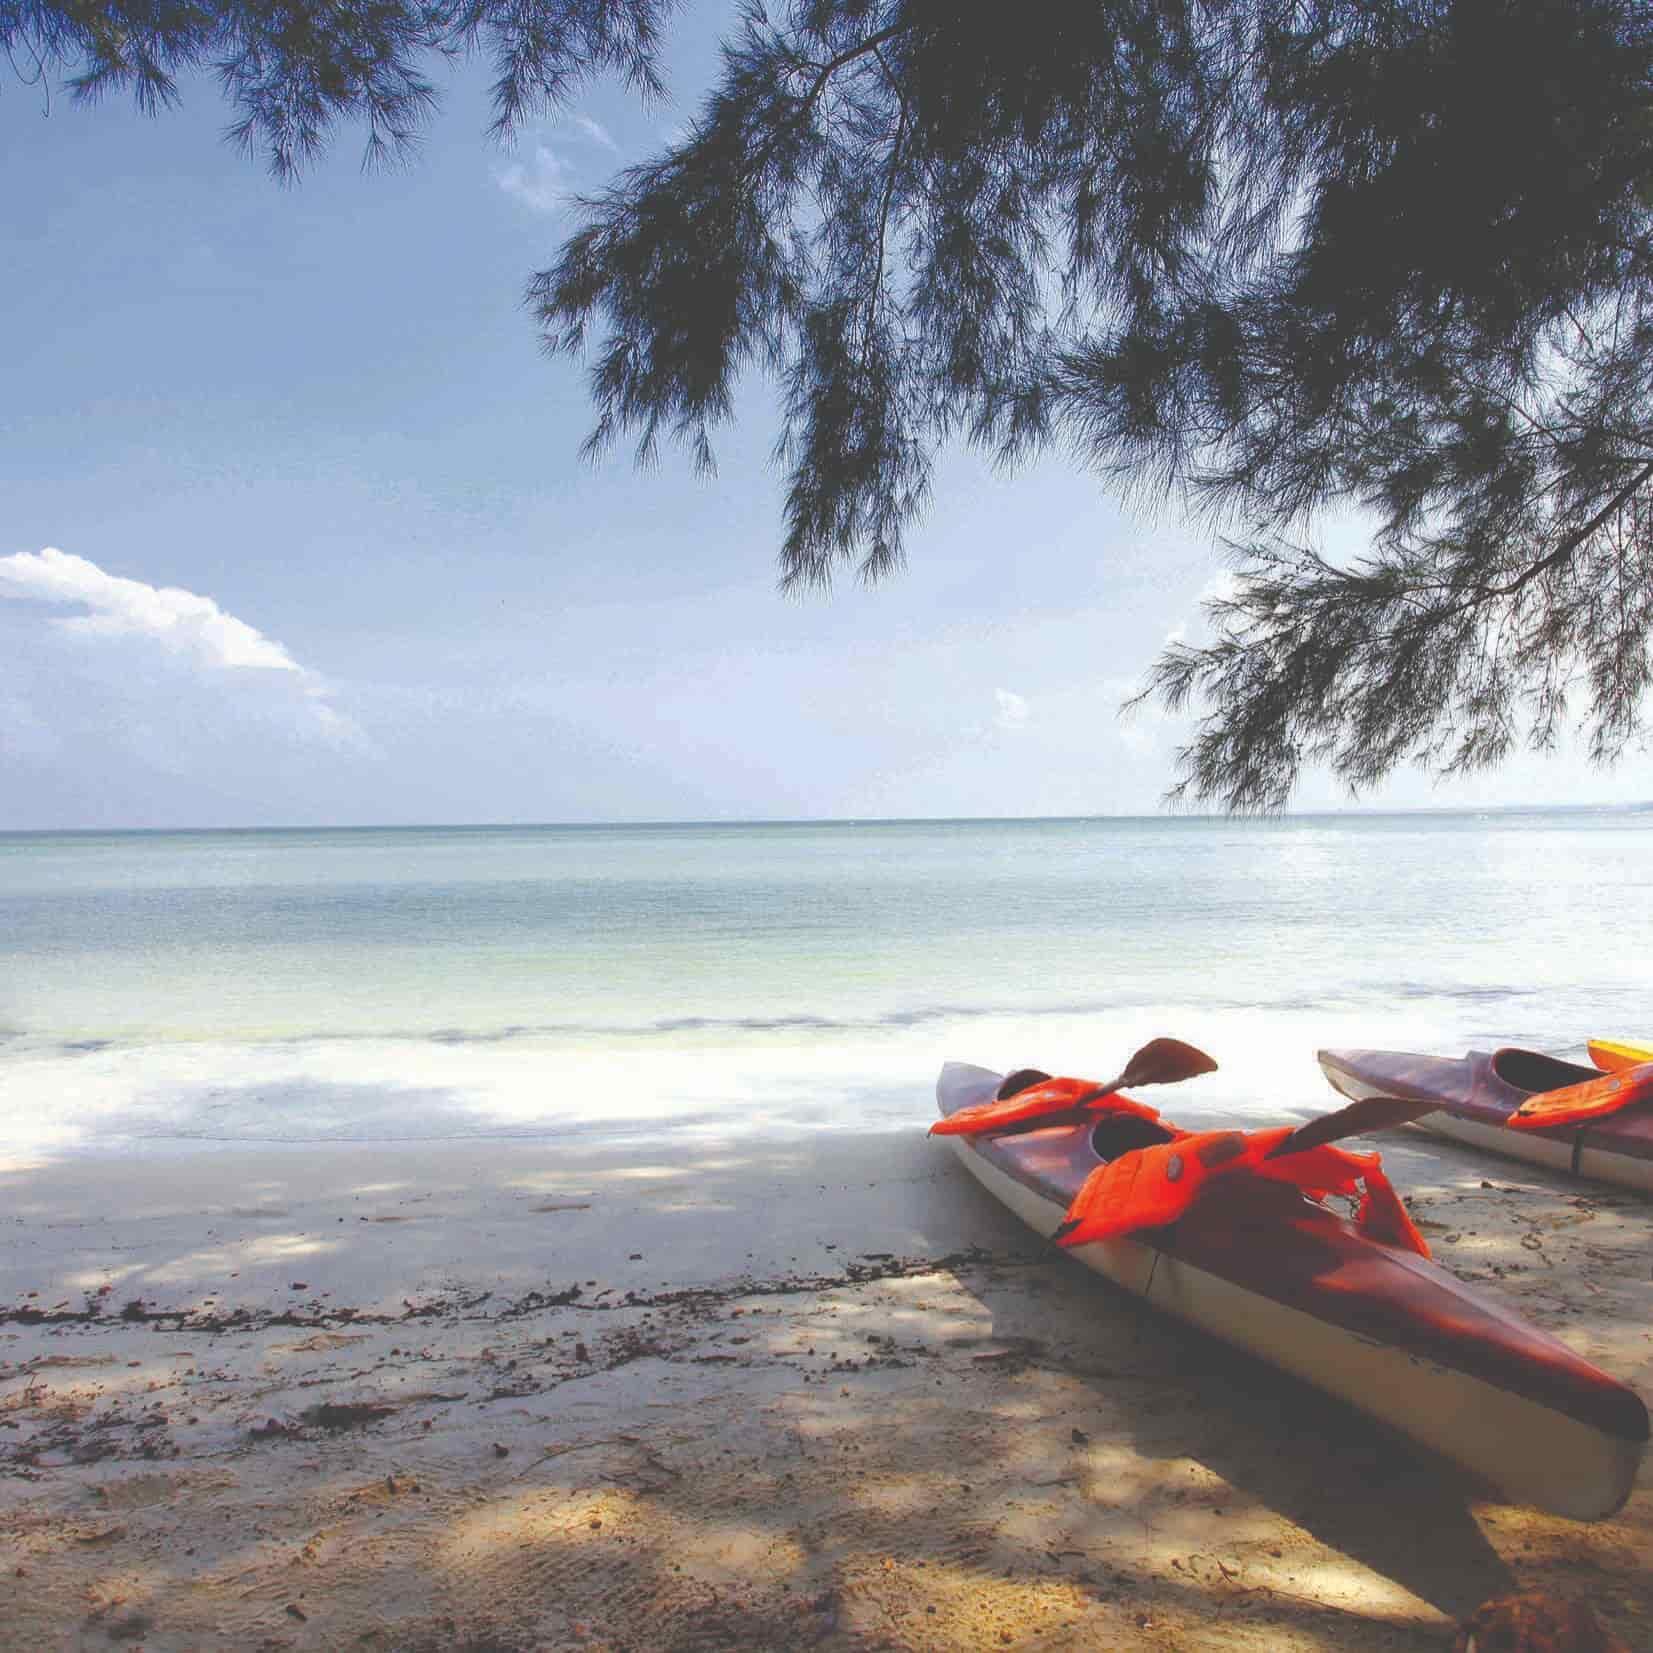 News 2020 - RMCO effect to Port Dickson Beaches | Lexis Hibiscus® Port Dickson